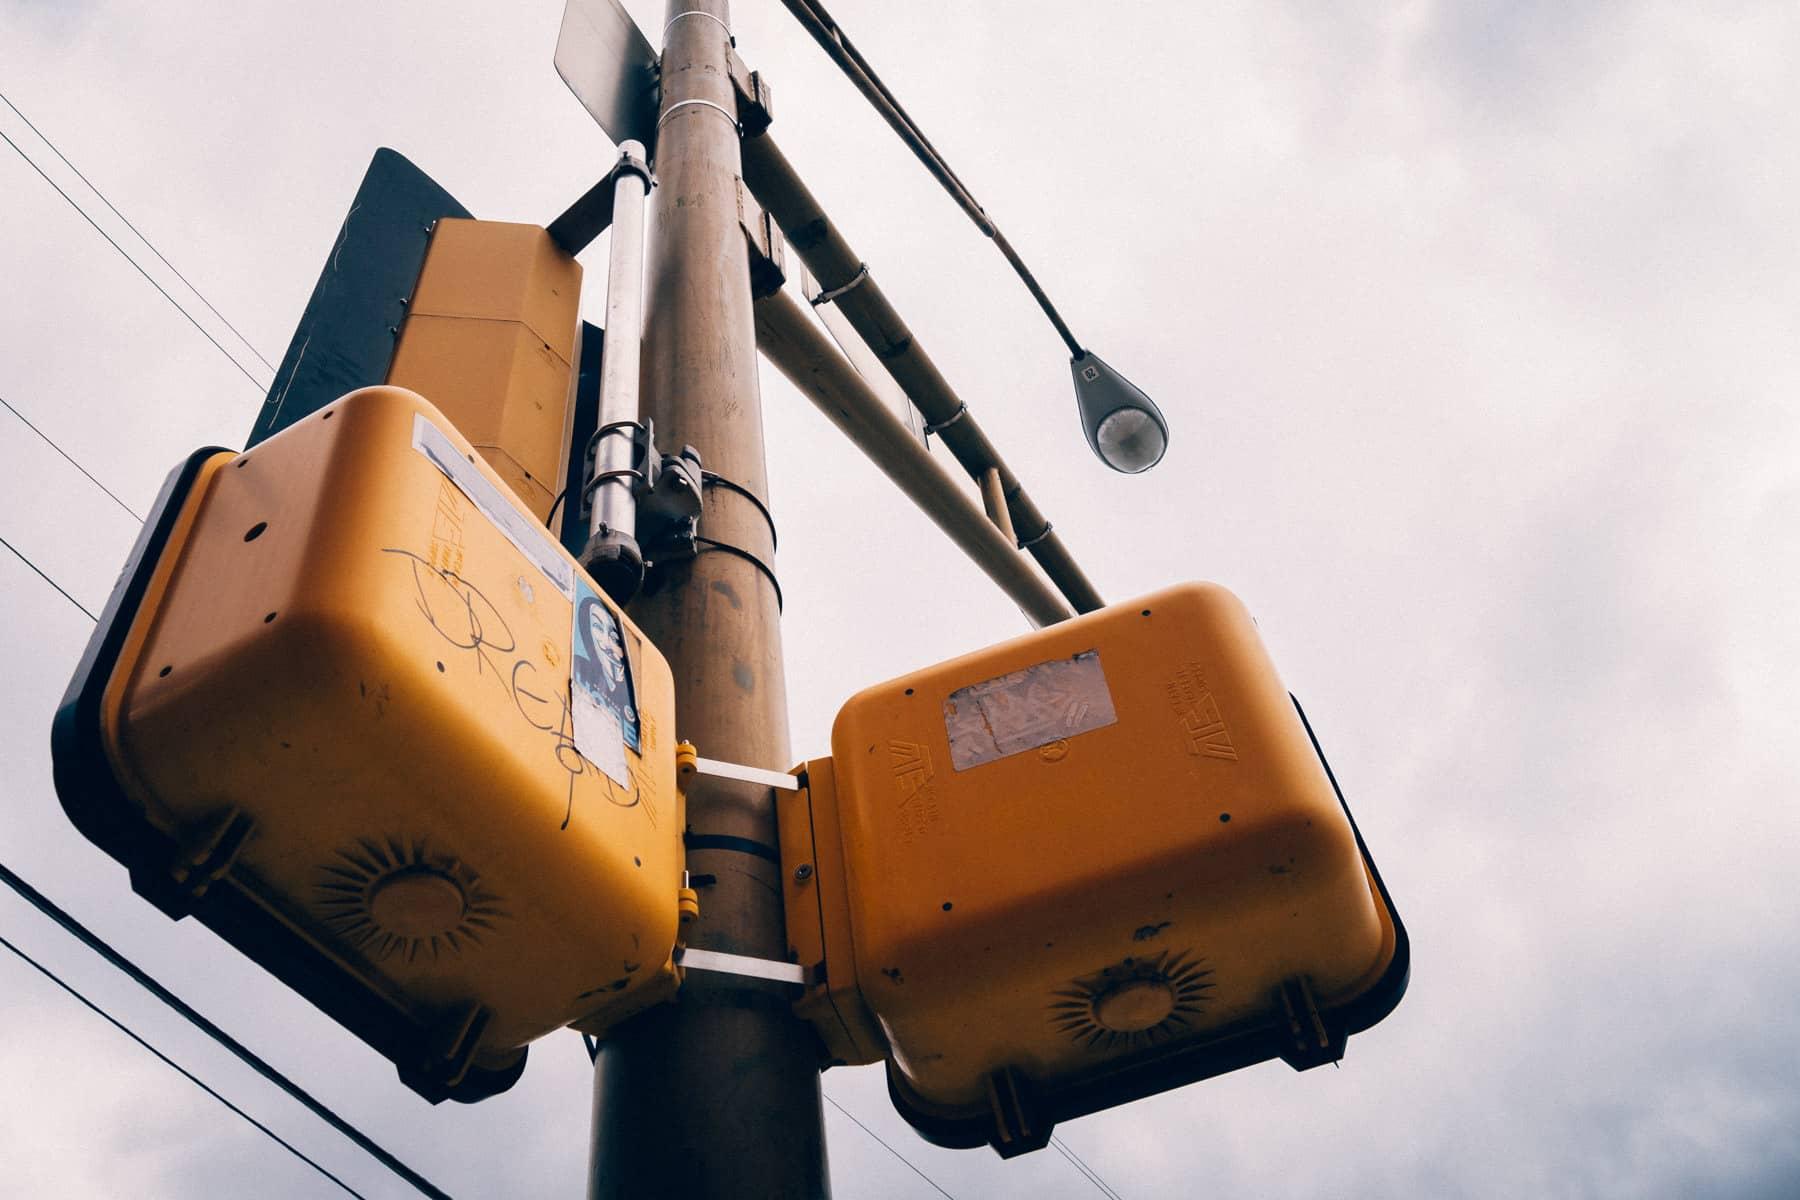 Pedestrian walk/don't walk signal boxes on a light pole in Dallas' Deep Ellum neighborhood.